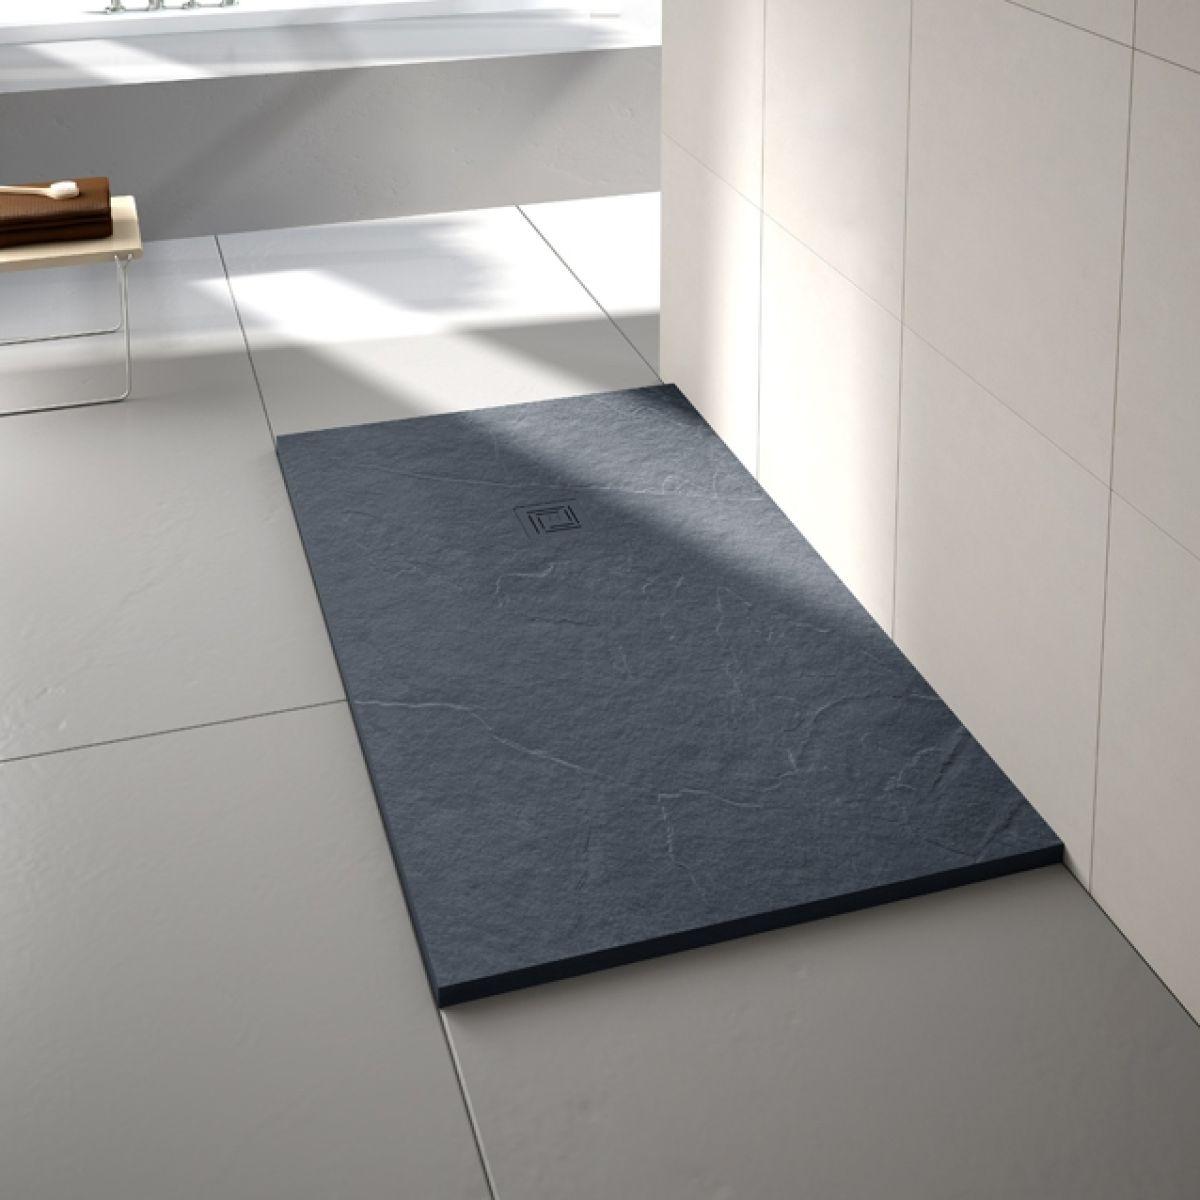 Merlyn Truestone Slate Black Rectangular Shower Tray 1000 x 800mm